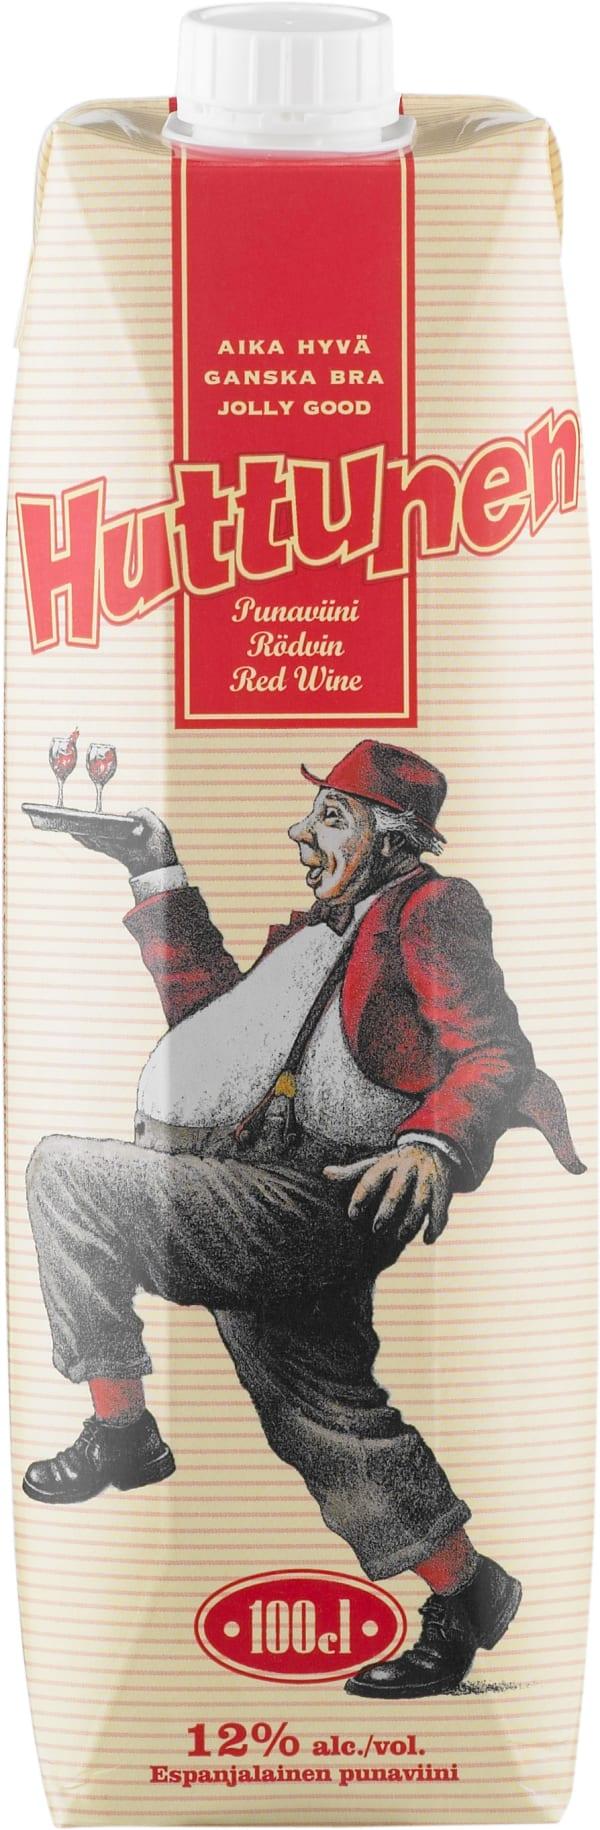 Huttunen Punaviini carton package